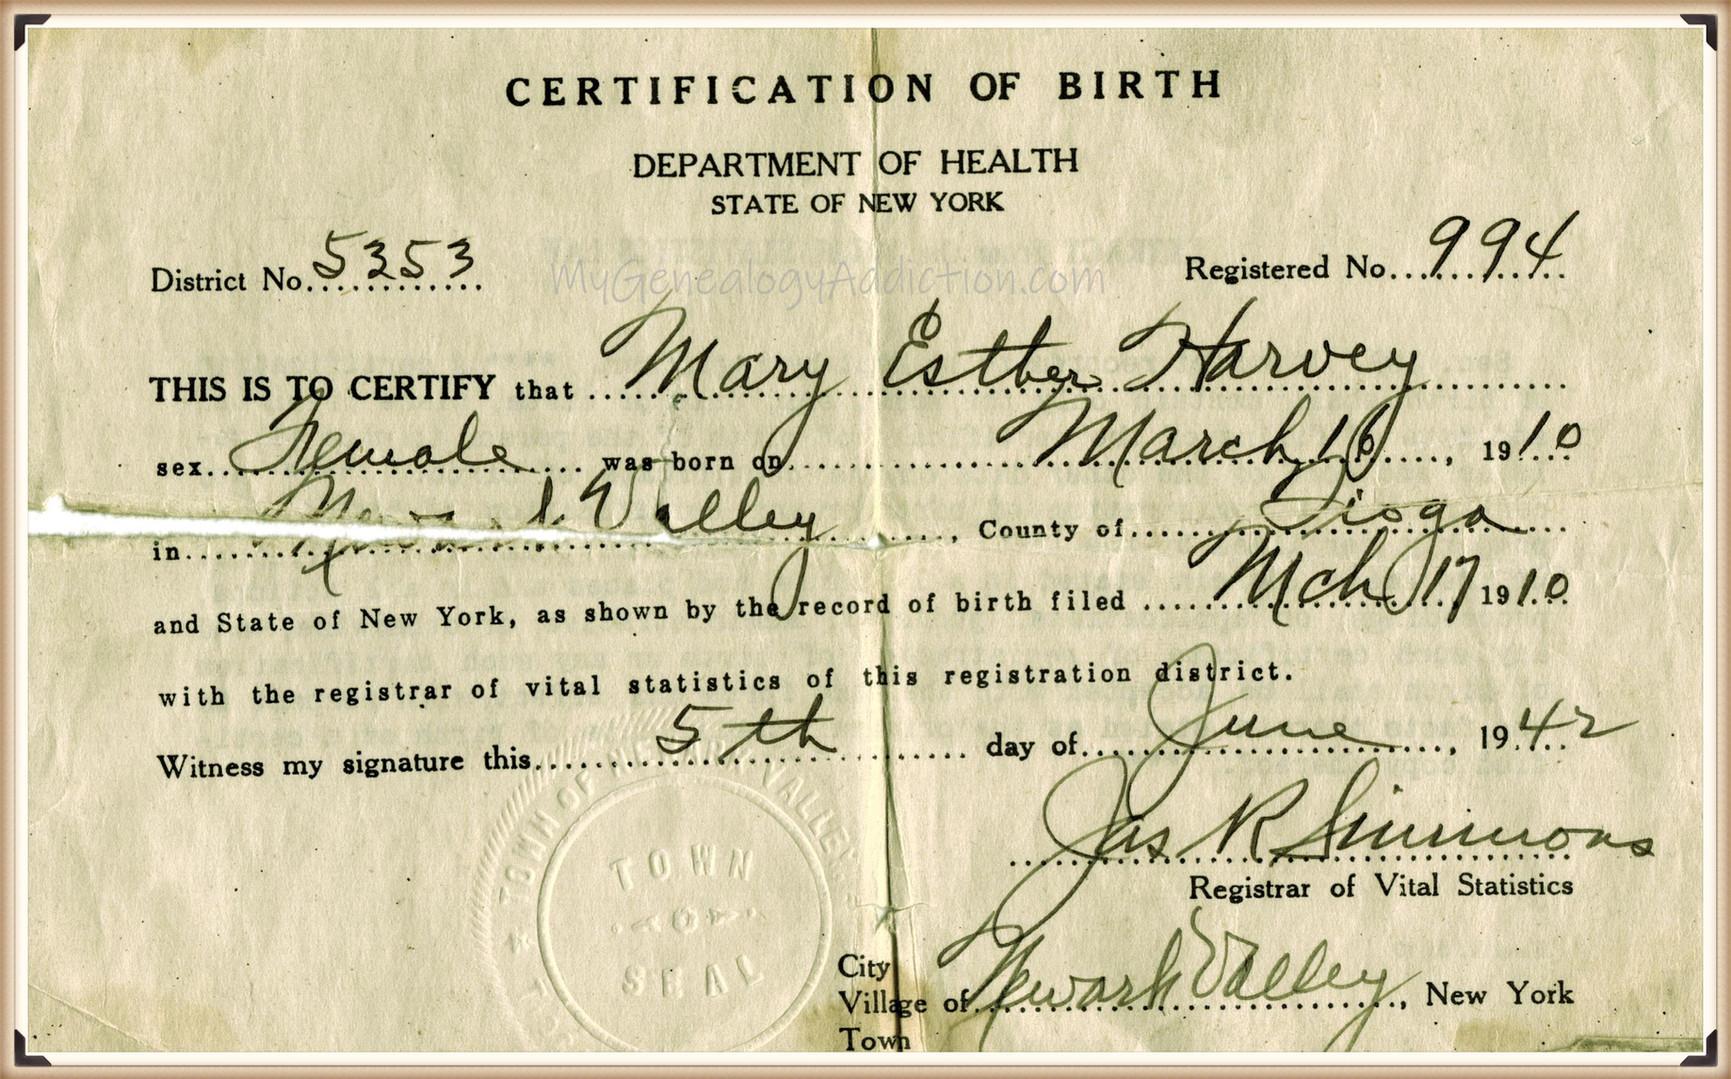 Mary E. (Harvey) Reese Gaul birth